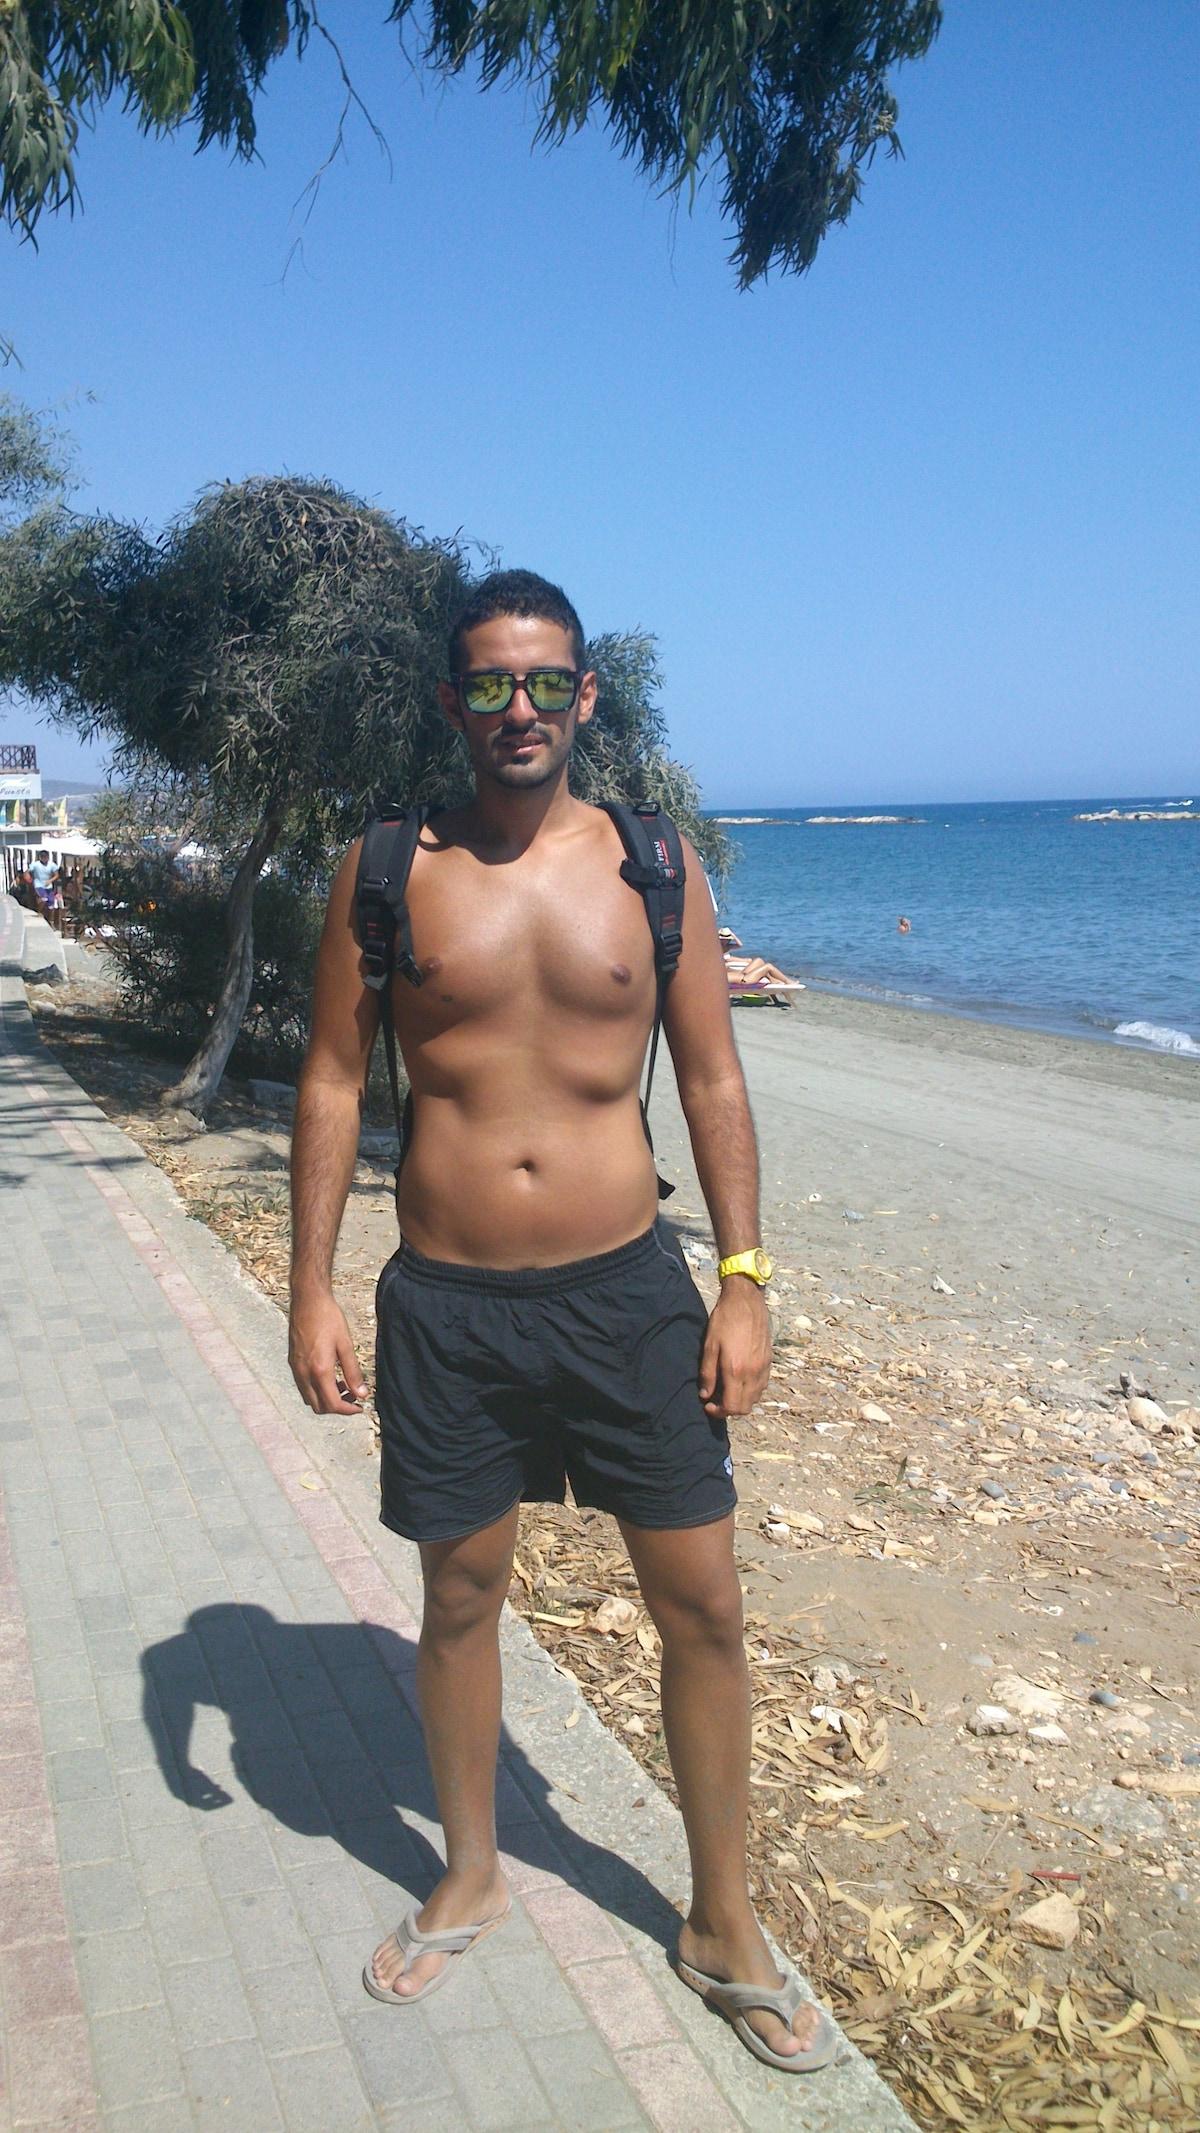 Solonas from Limassol